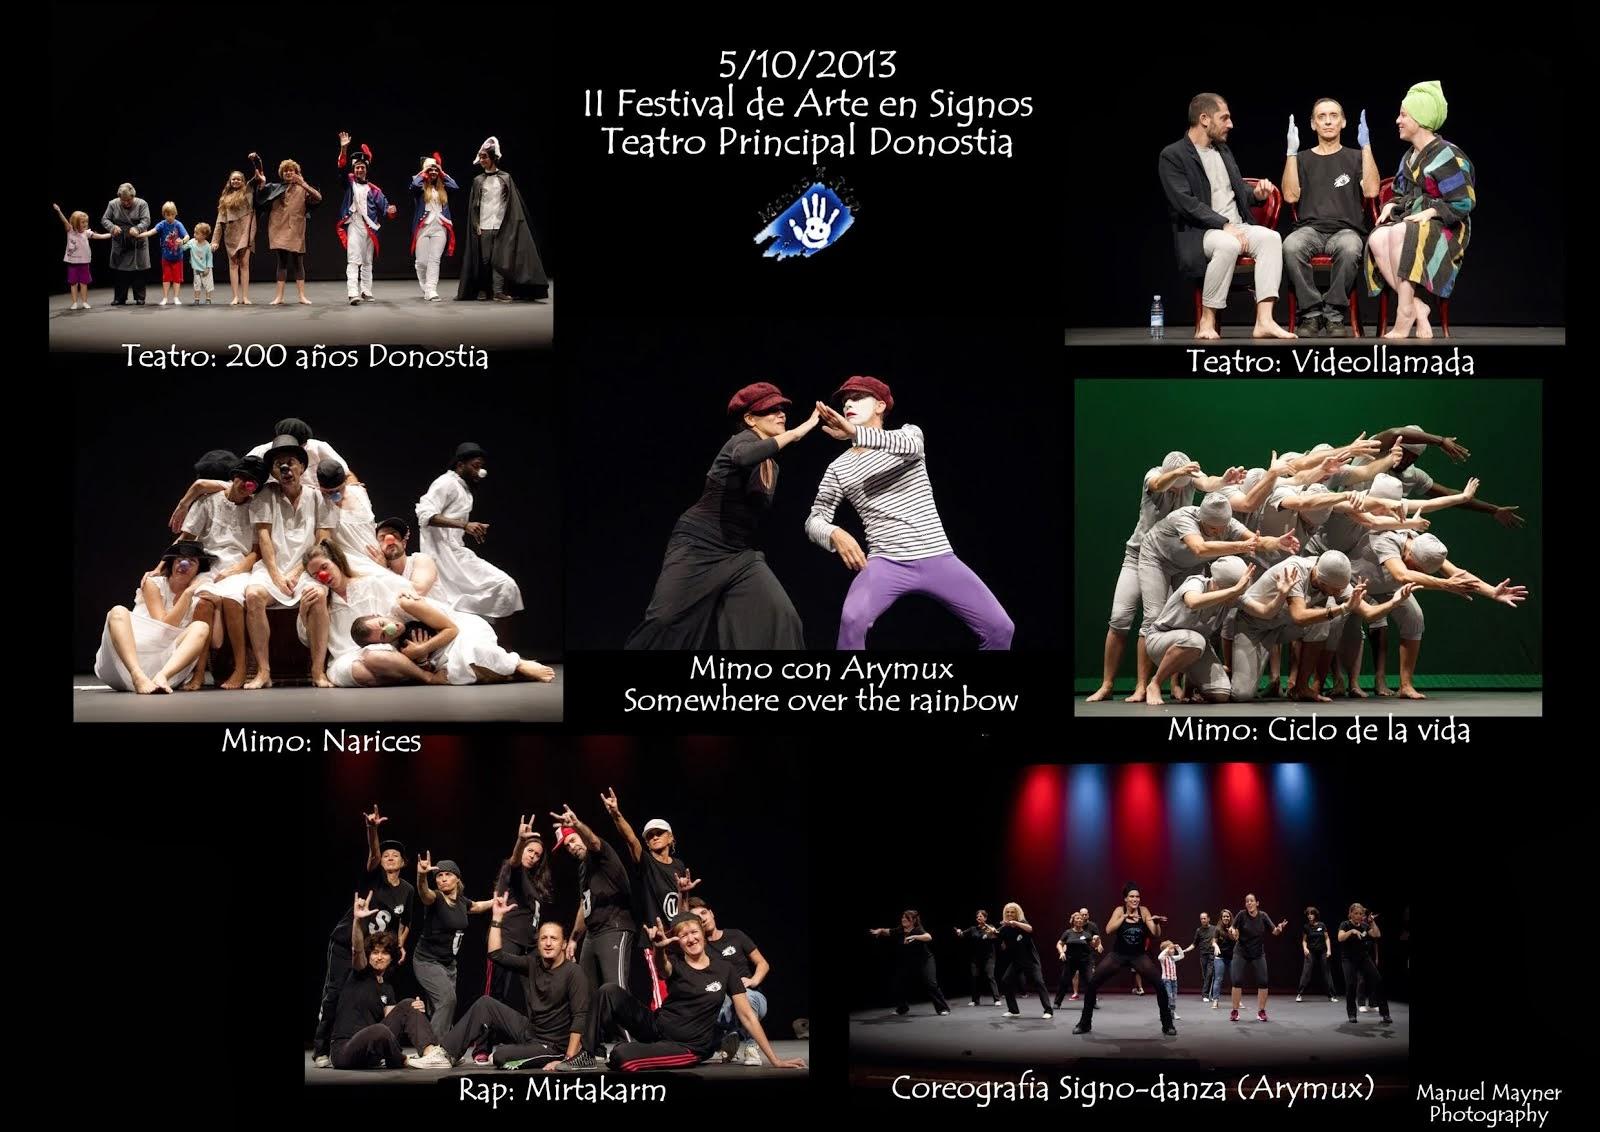 FOTO II FESTIAVL DE ARTE EN SIGNOS EXITO